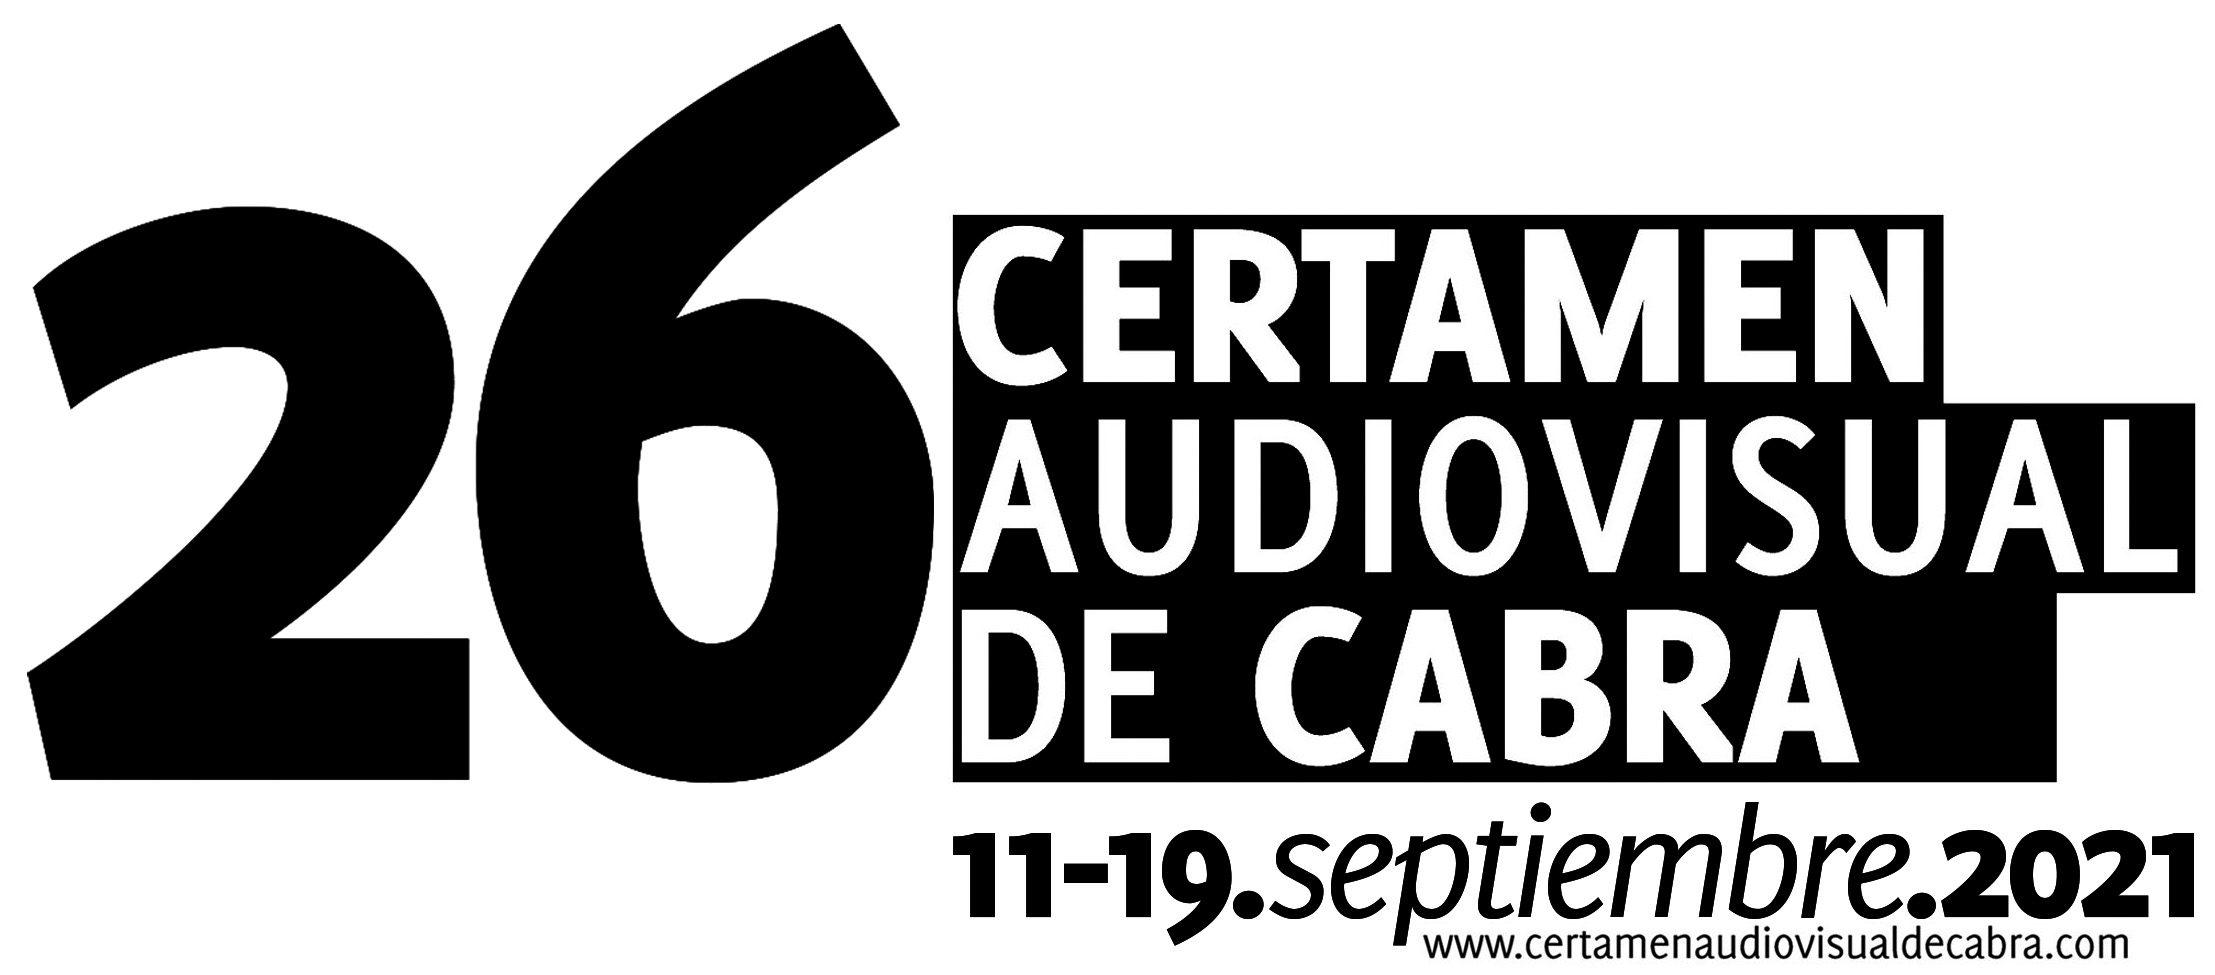 Certamen Audiovisual de Cabra